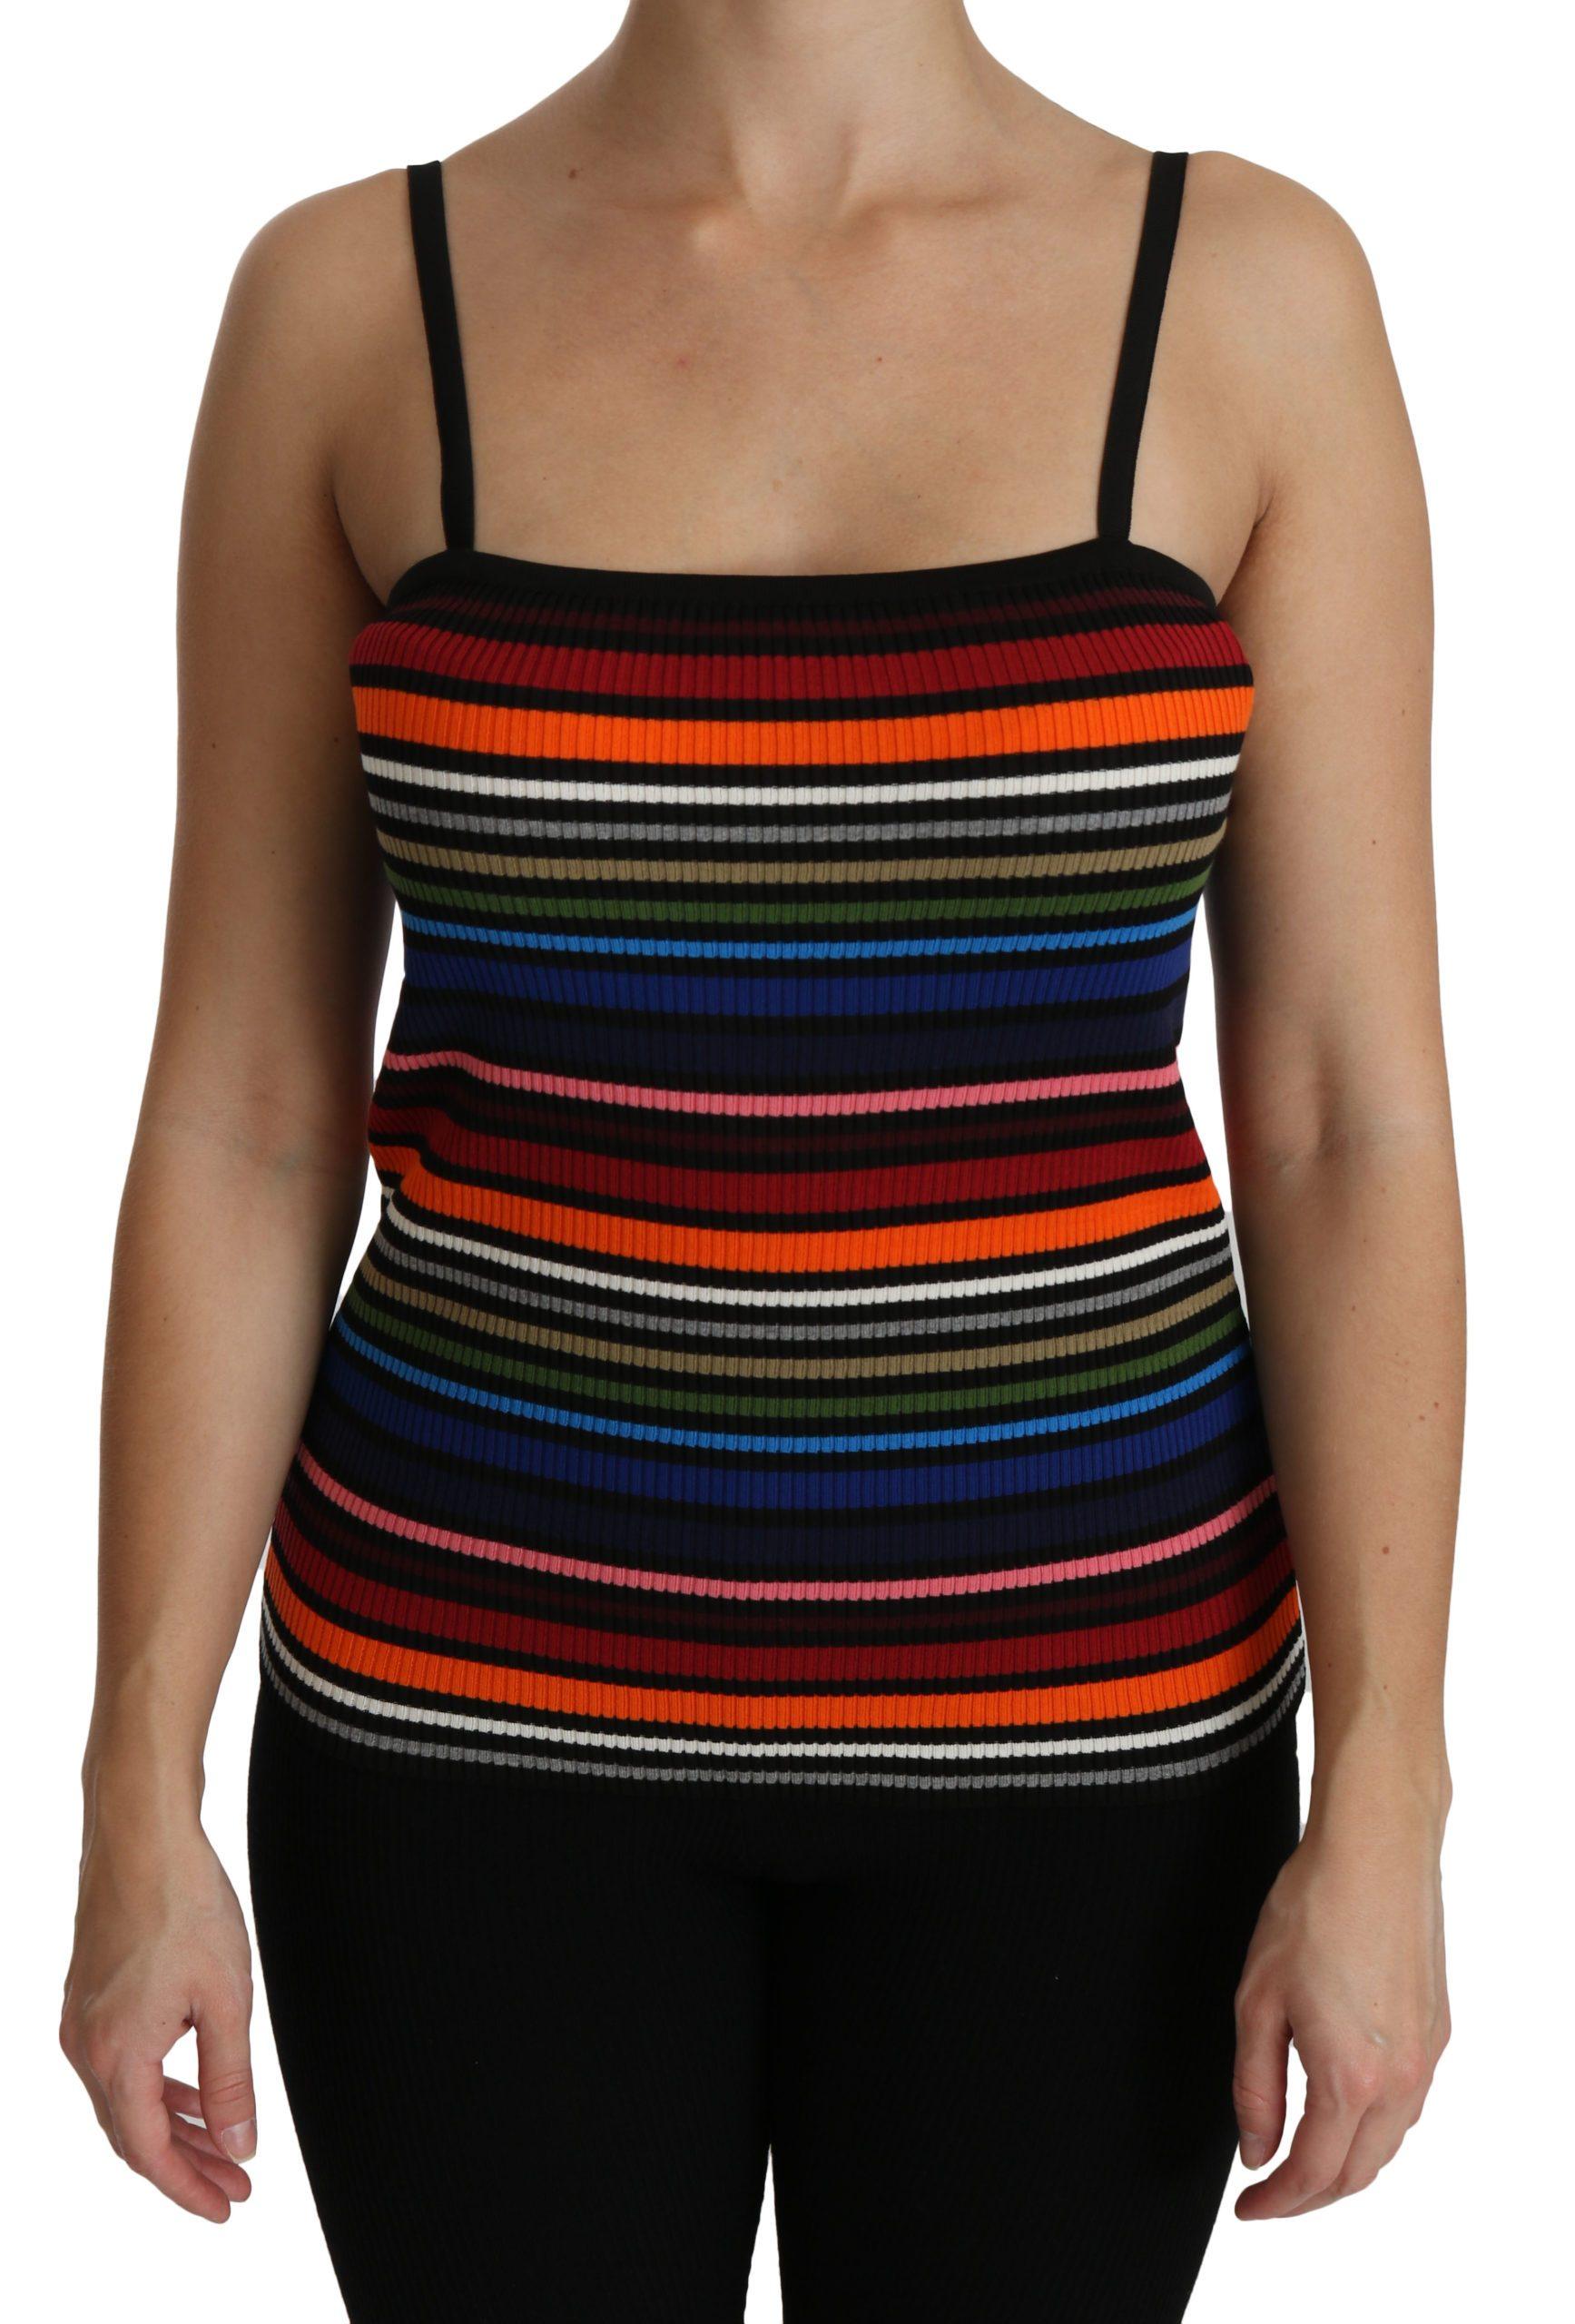 Black Striped Sleeveless Blouse Tank Cotton Top - IT44|L